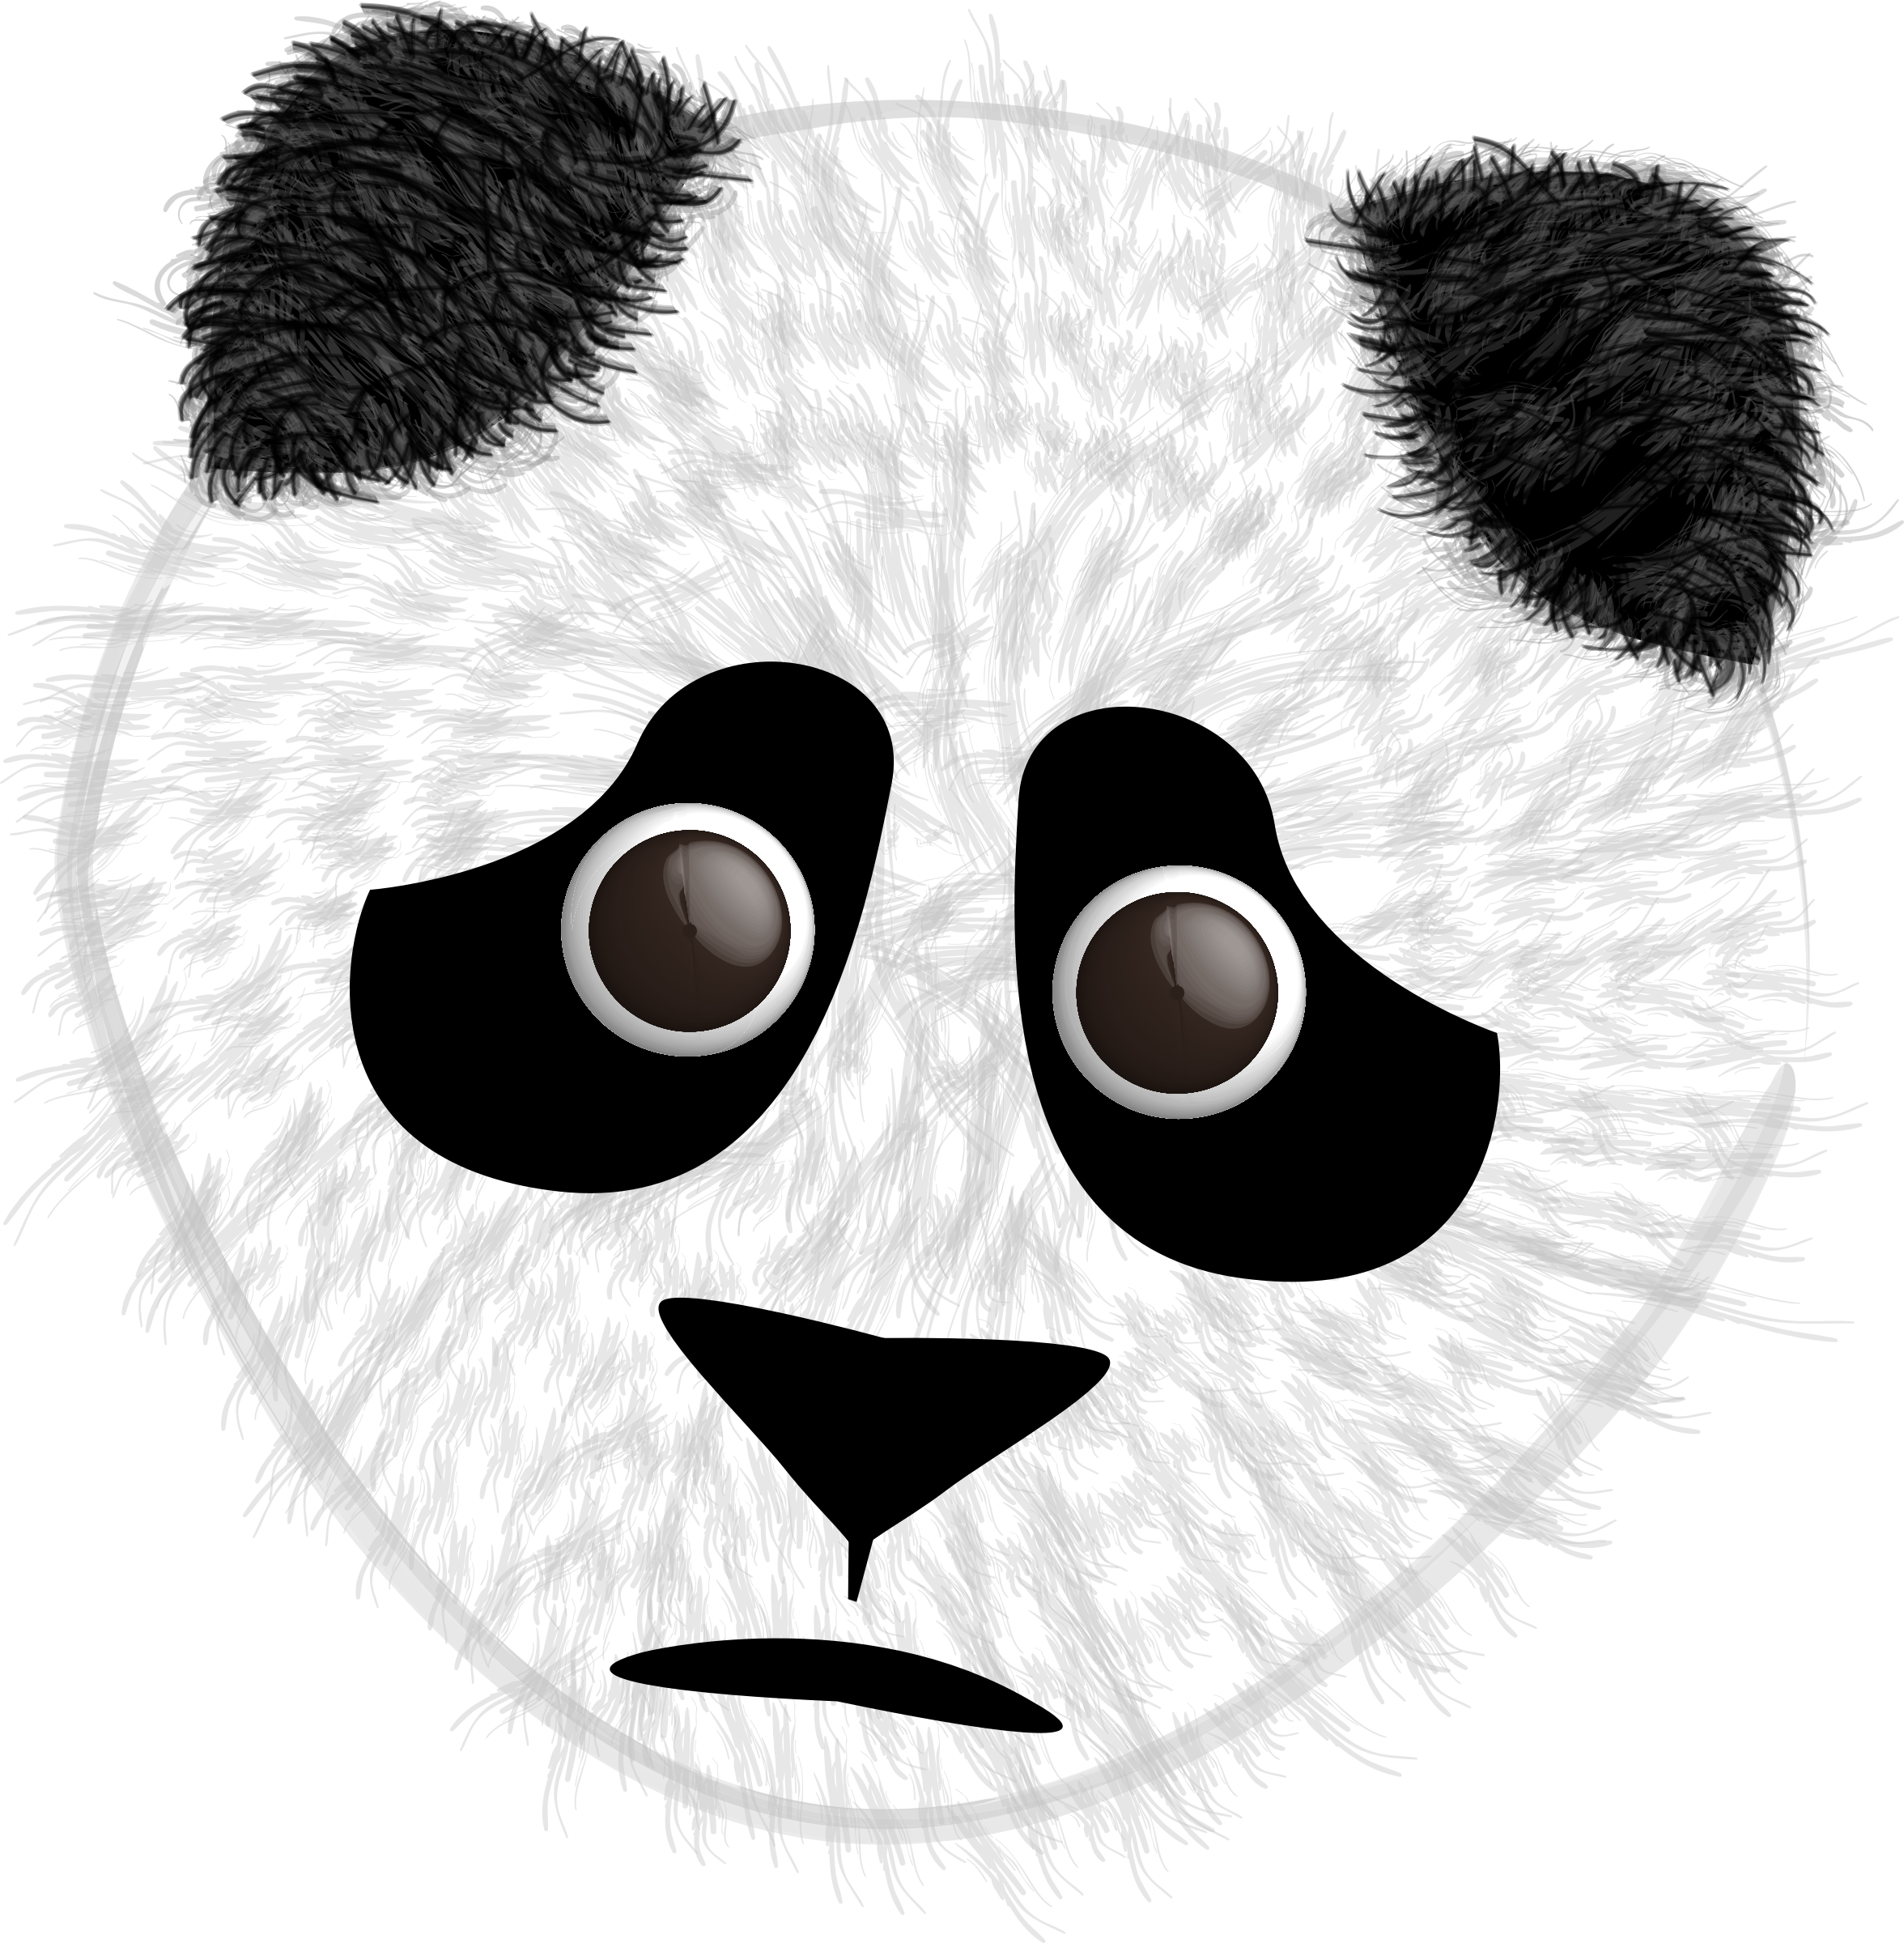 Bear big image png. Clipart panda fuzzy